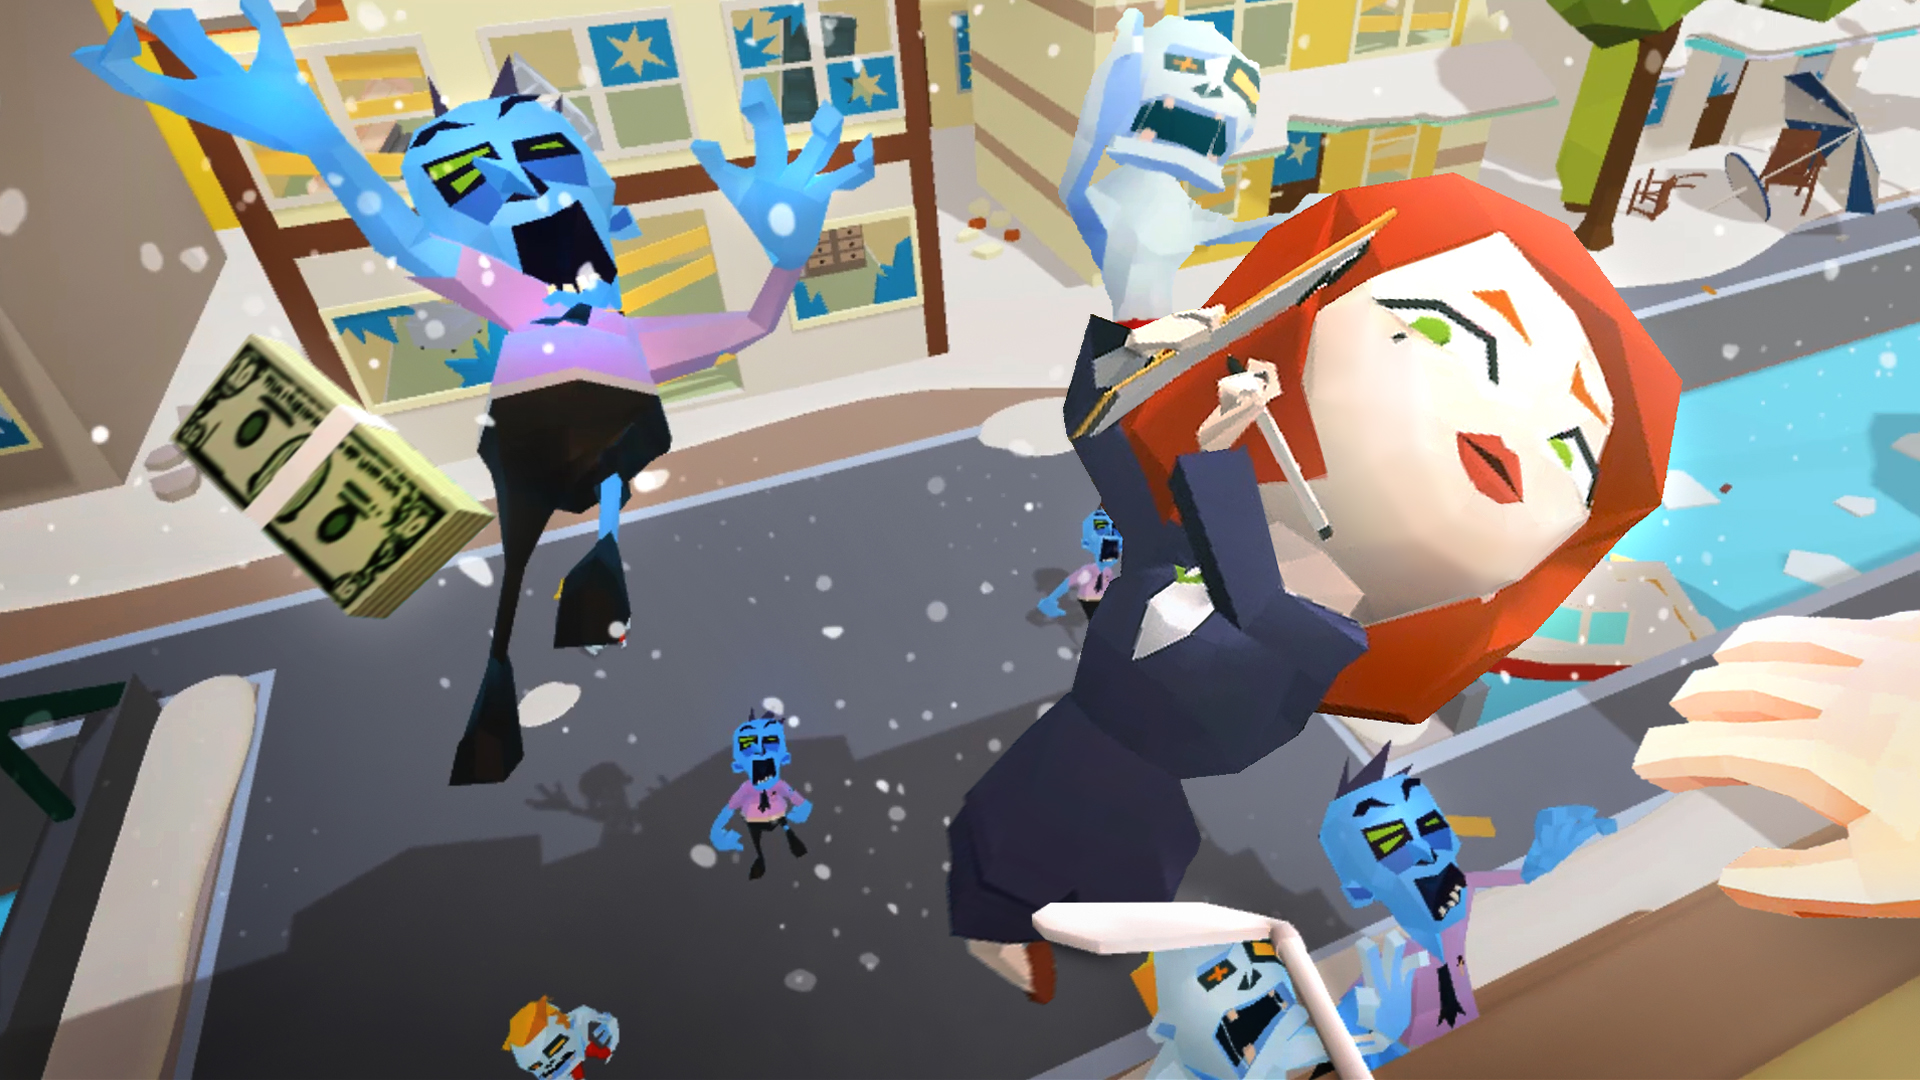 Oculus Quest 游戏《Throw Anything》扔东西砸僵尸插图